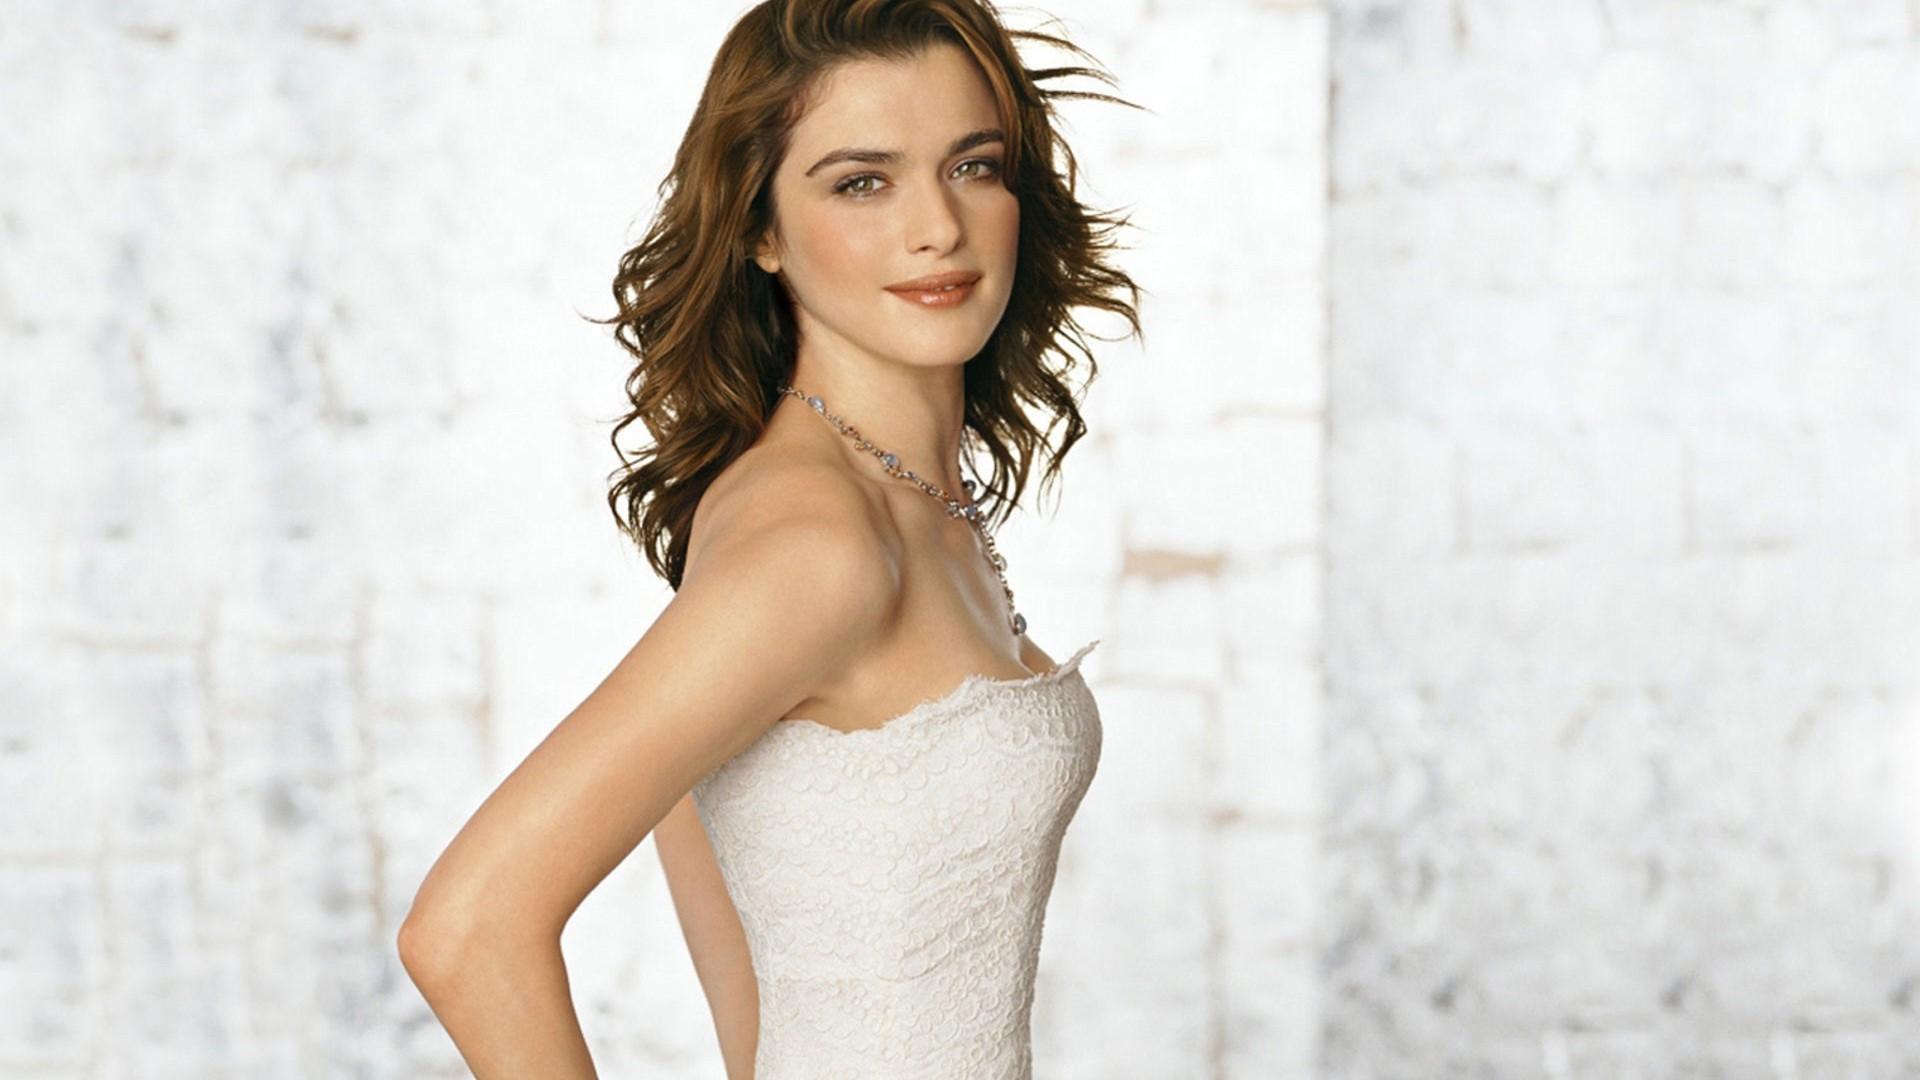 Hintergrundbilder : Modell-, lange Haare, Brünette, Fotografie ...